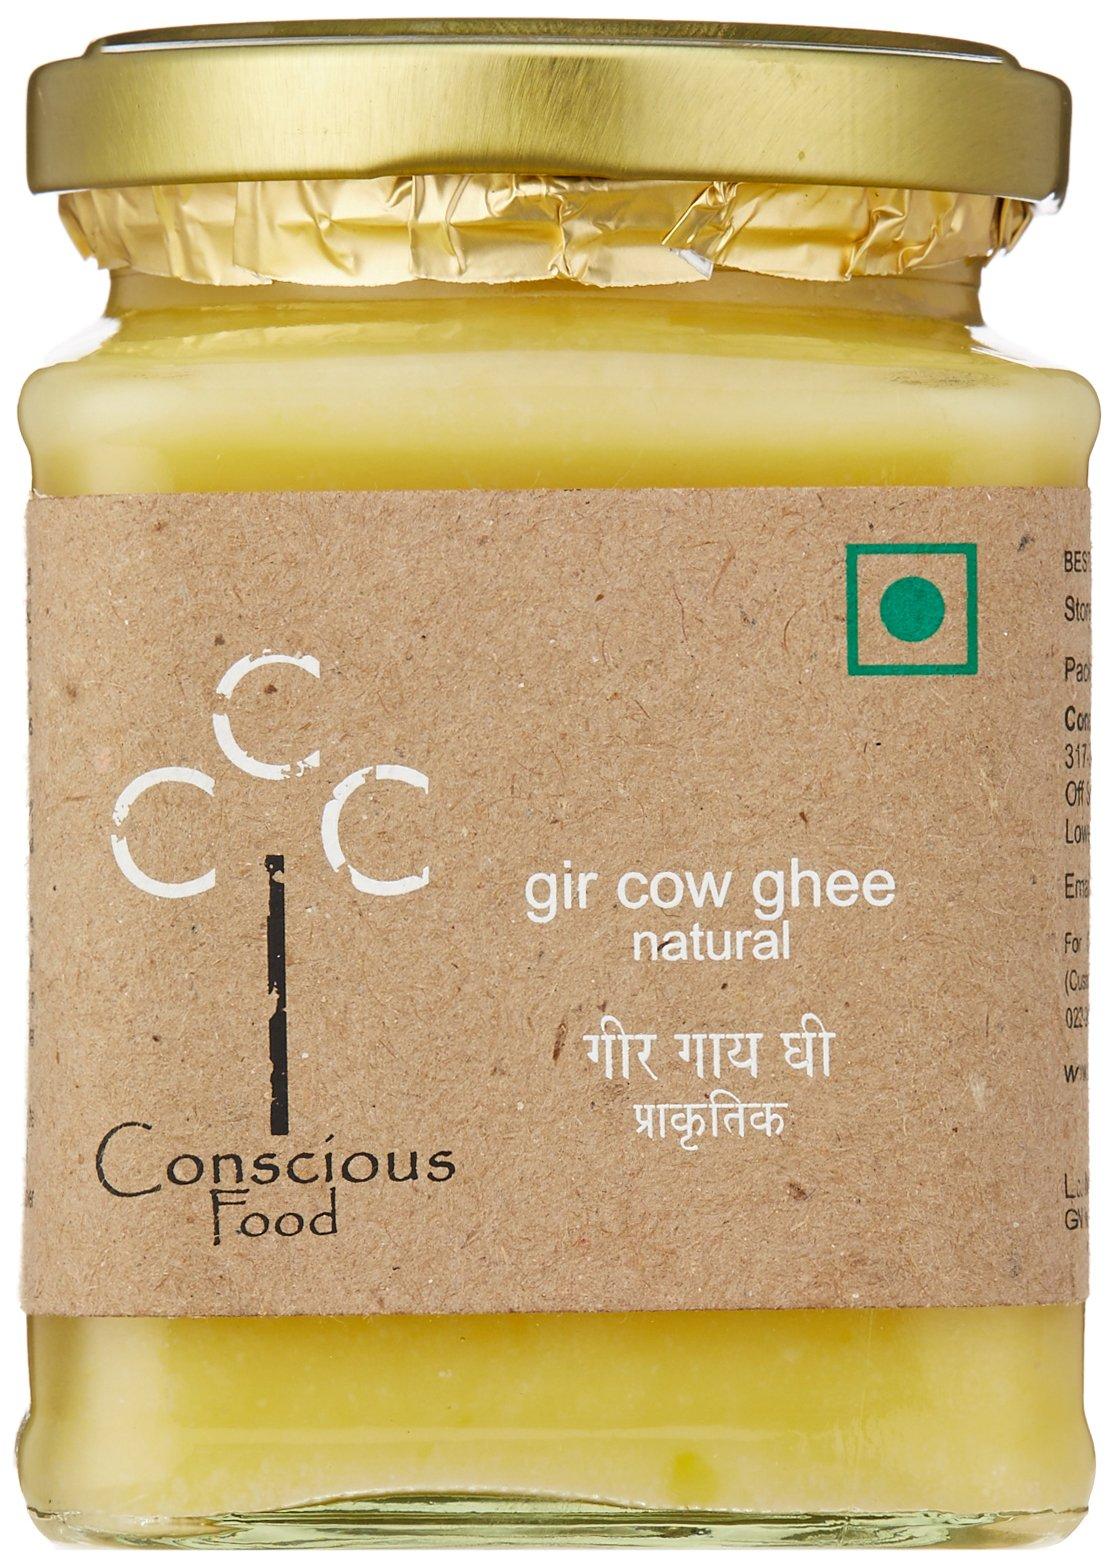 Conscious Food Gir Cow Ghee Natural - 200g by Conscious Food